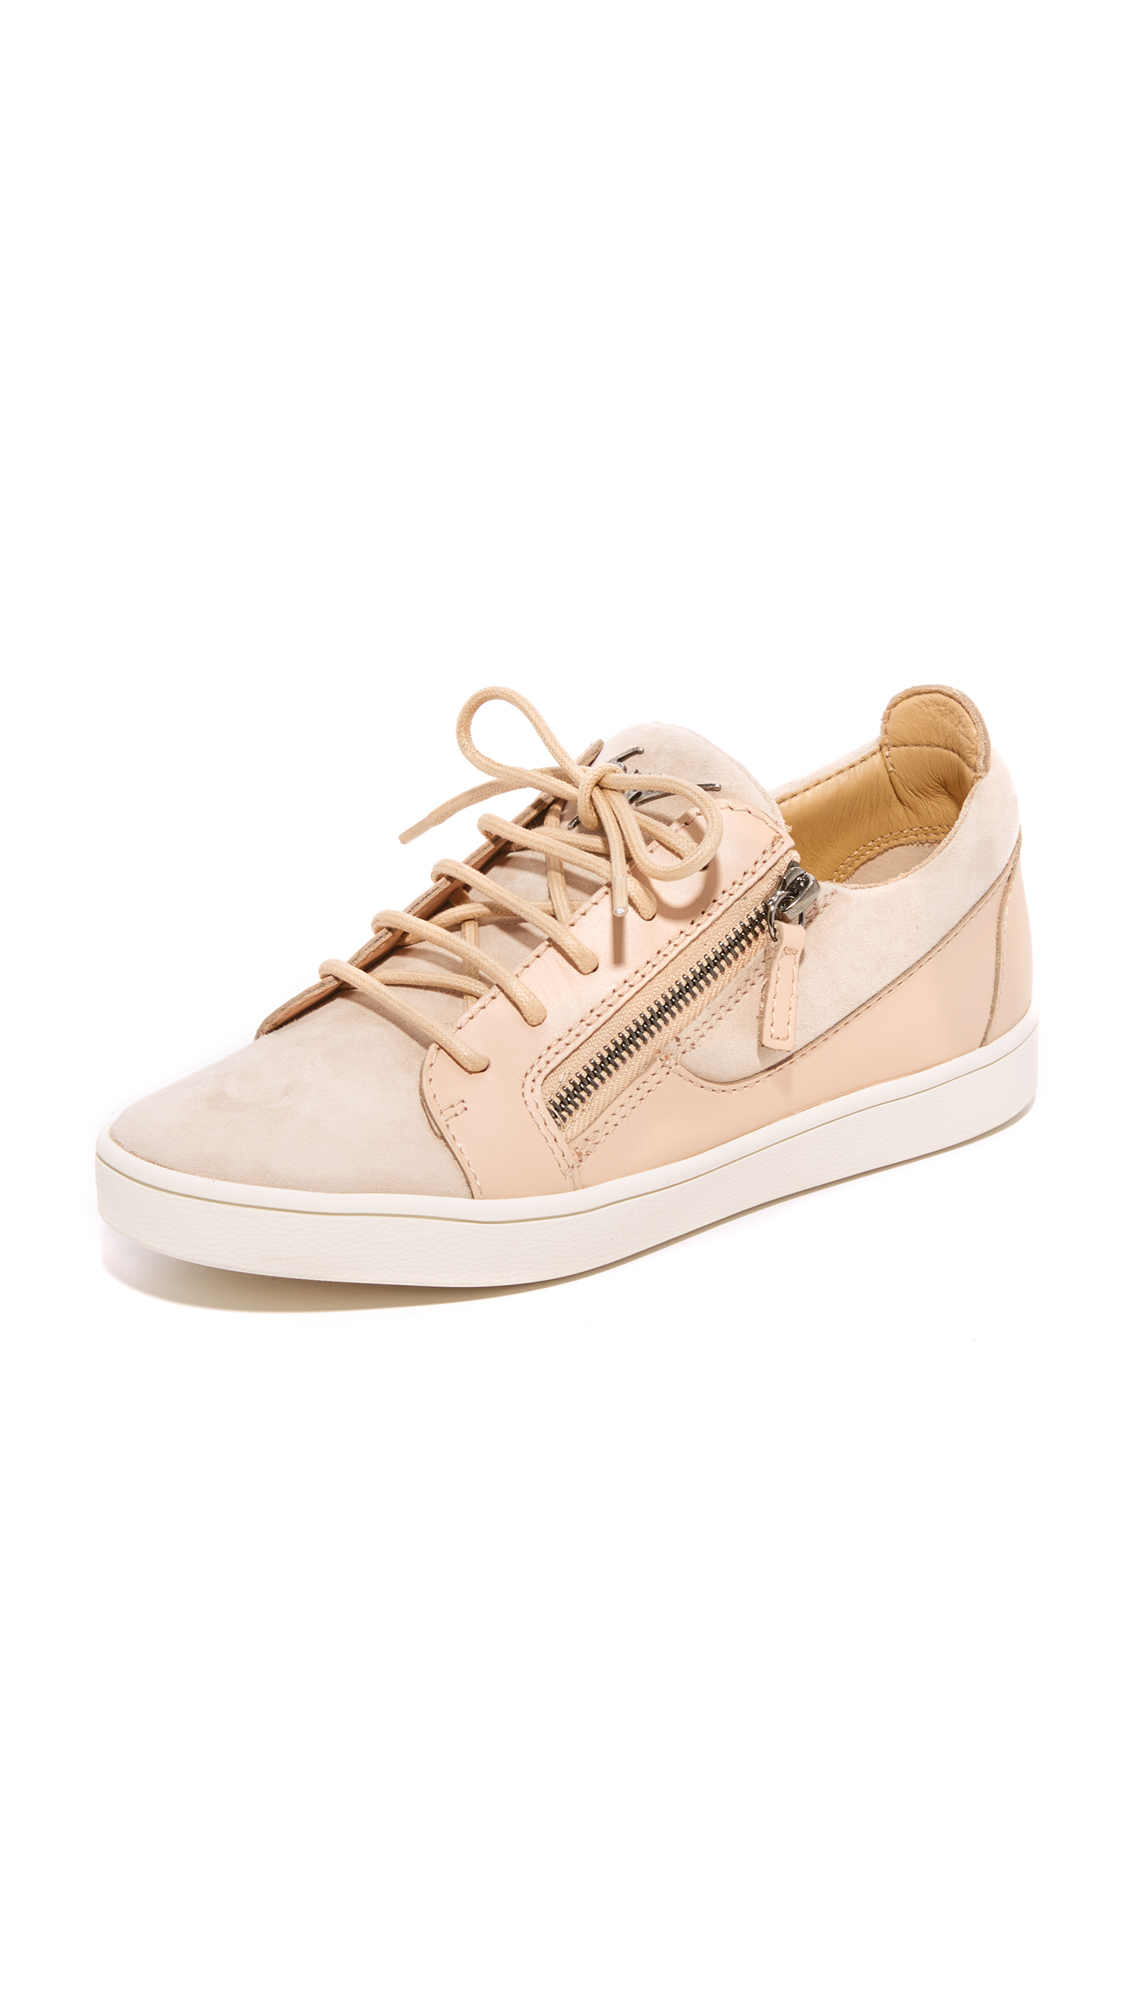 Giuseppe Zanotti Suede Sneakers - Pallido